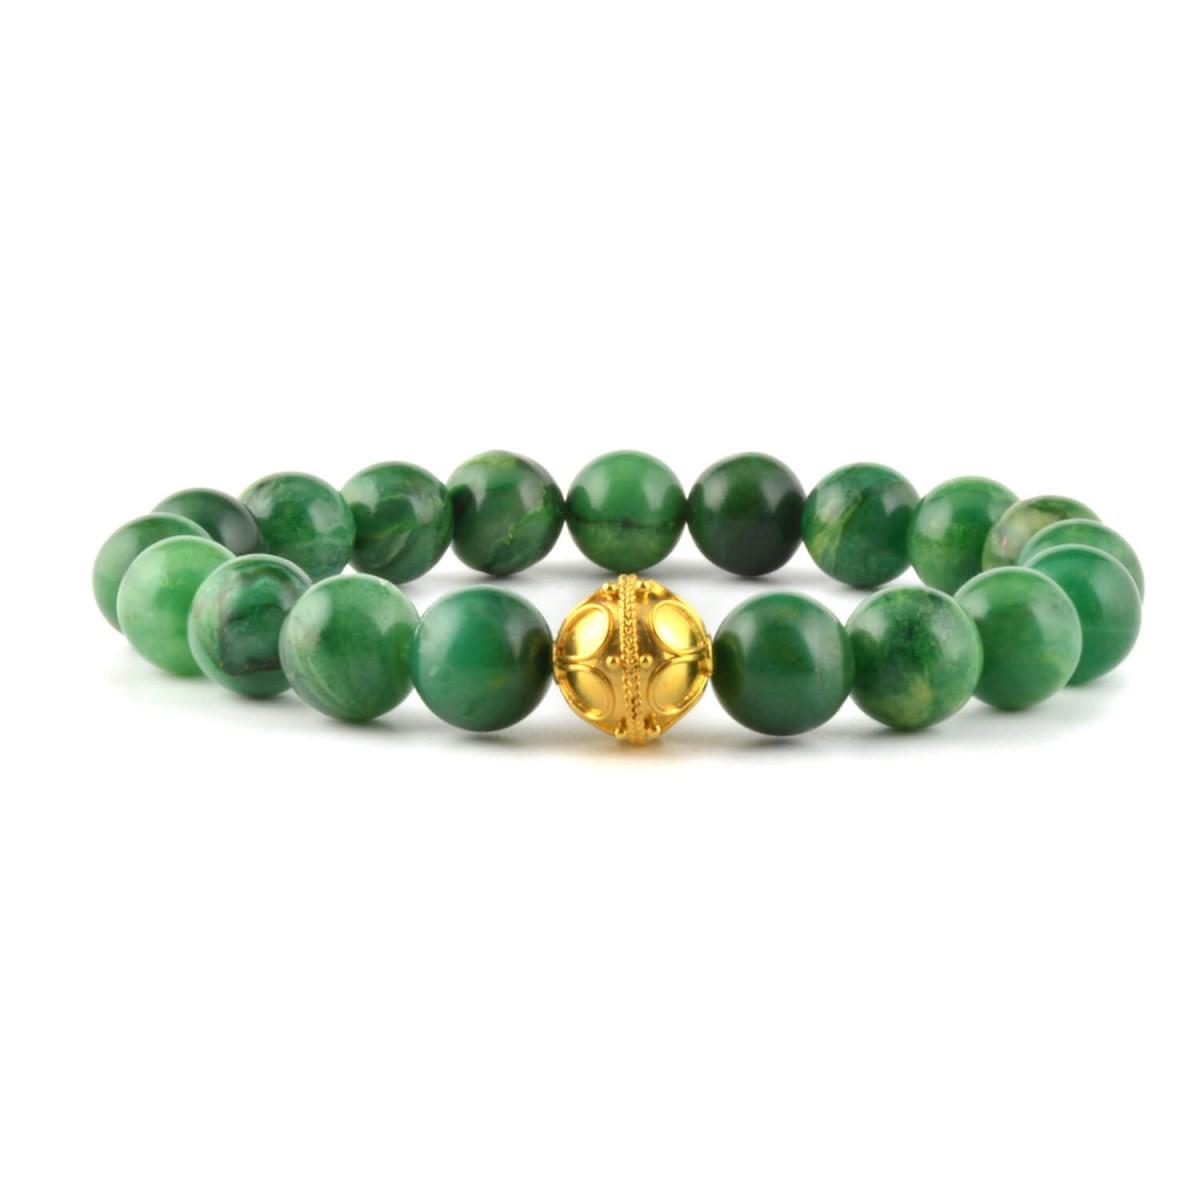 Armando Medium Africa Jade With Gold